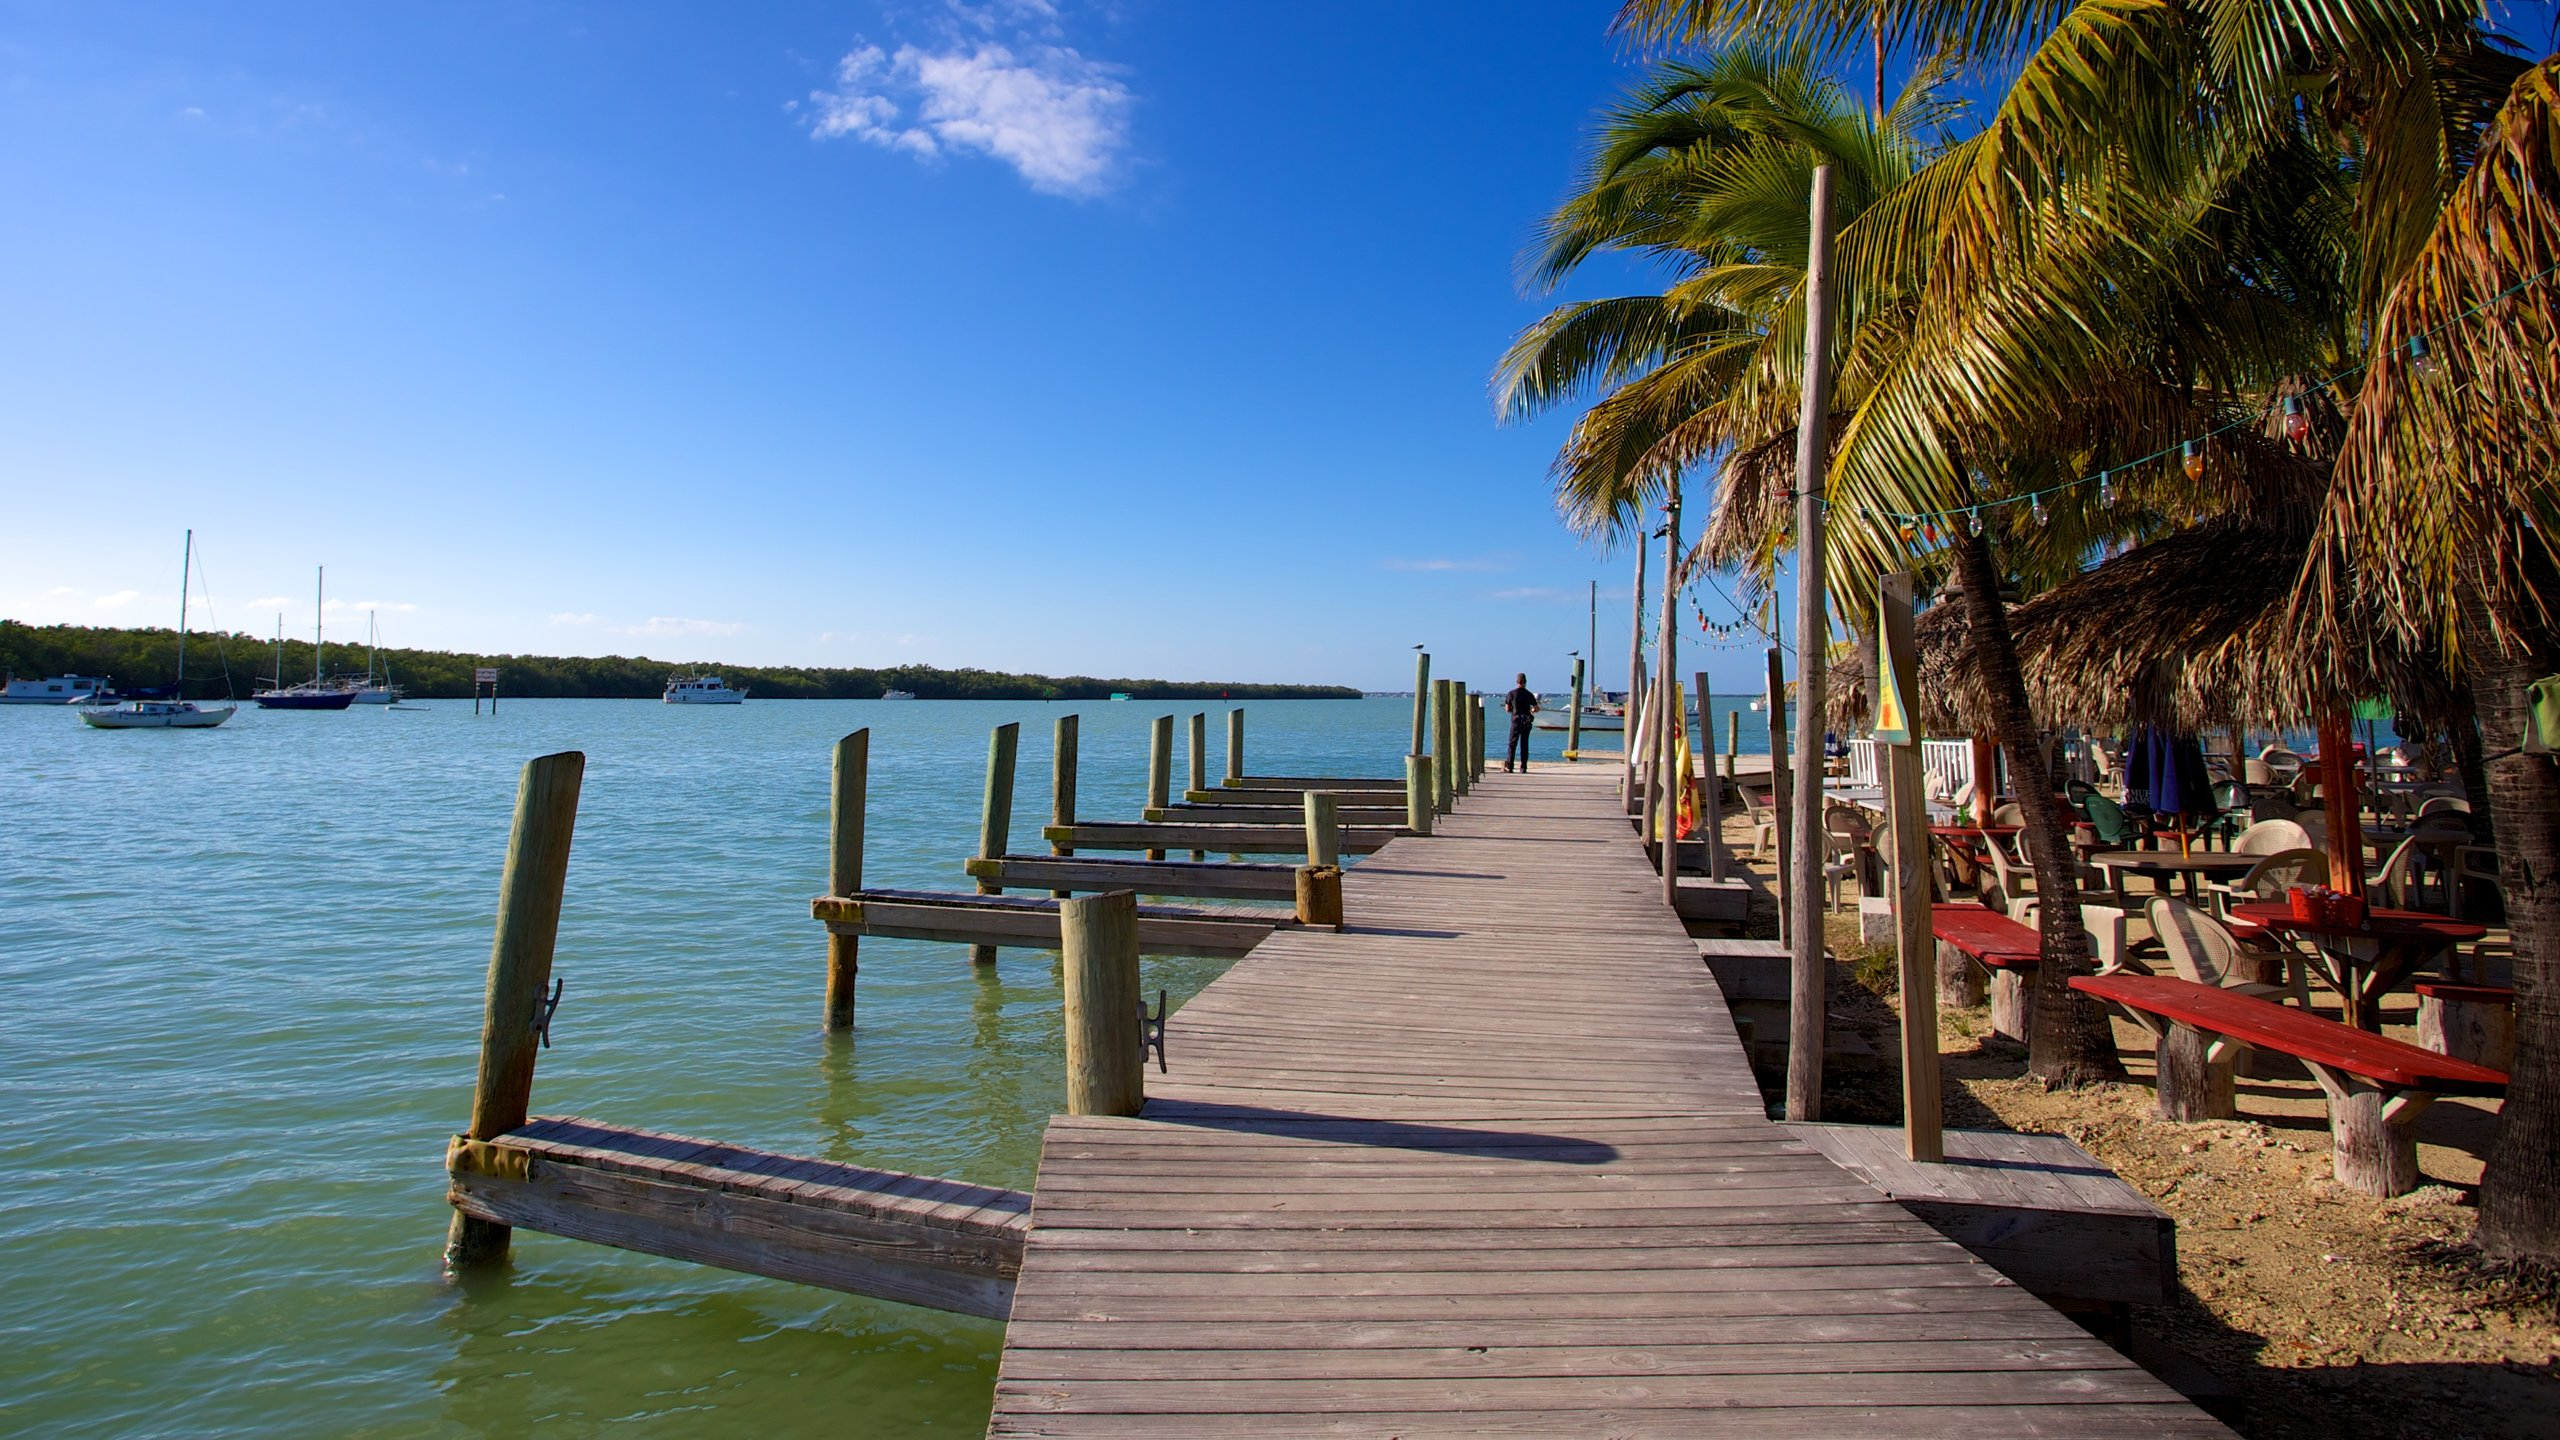 Florida Keys, United States of America